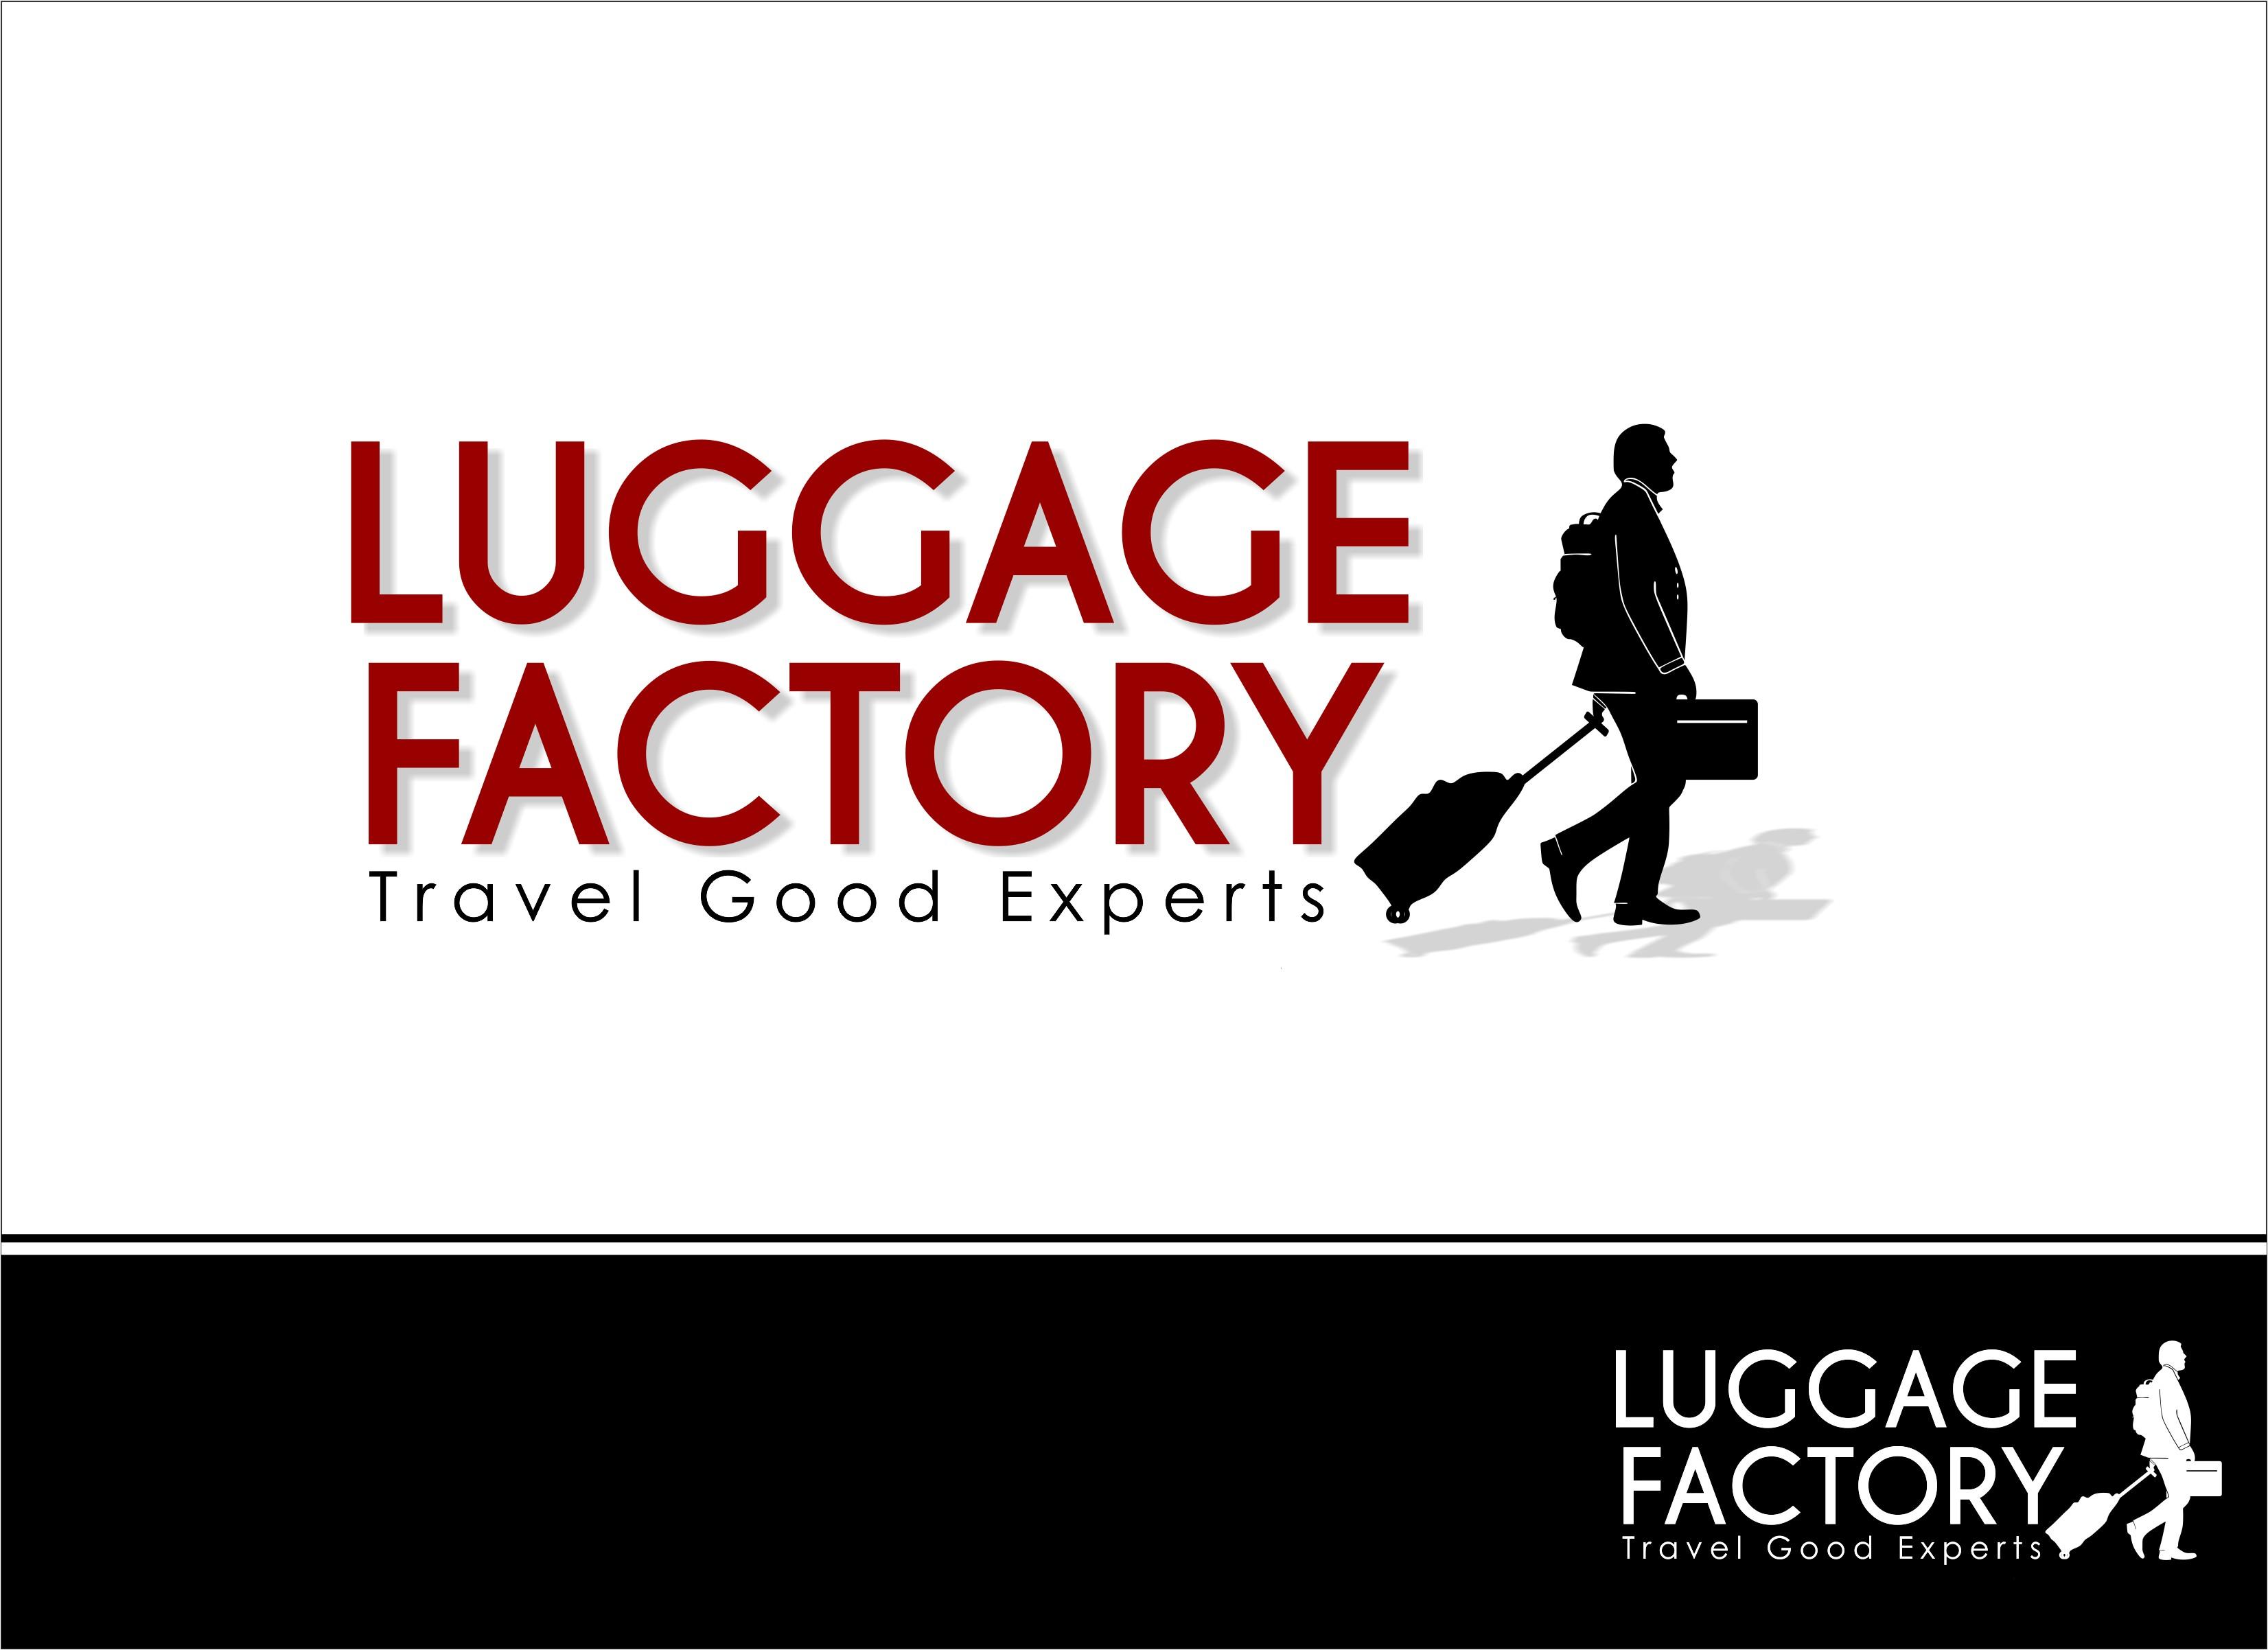 Logo Design by Mhon_Rose - Entry No. 163 in the Logo Design Contest Creative Logo Design for Luggage Factory.